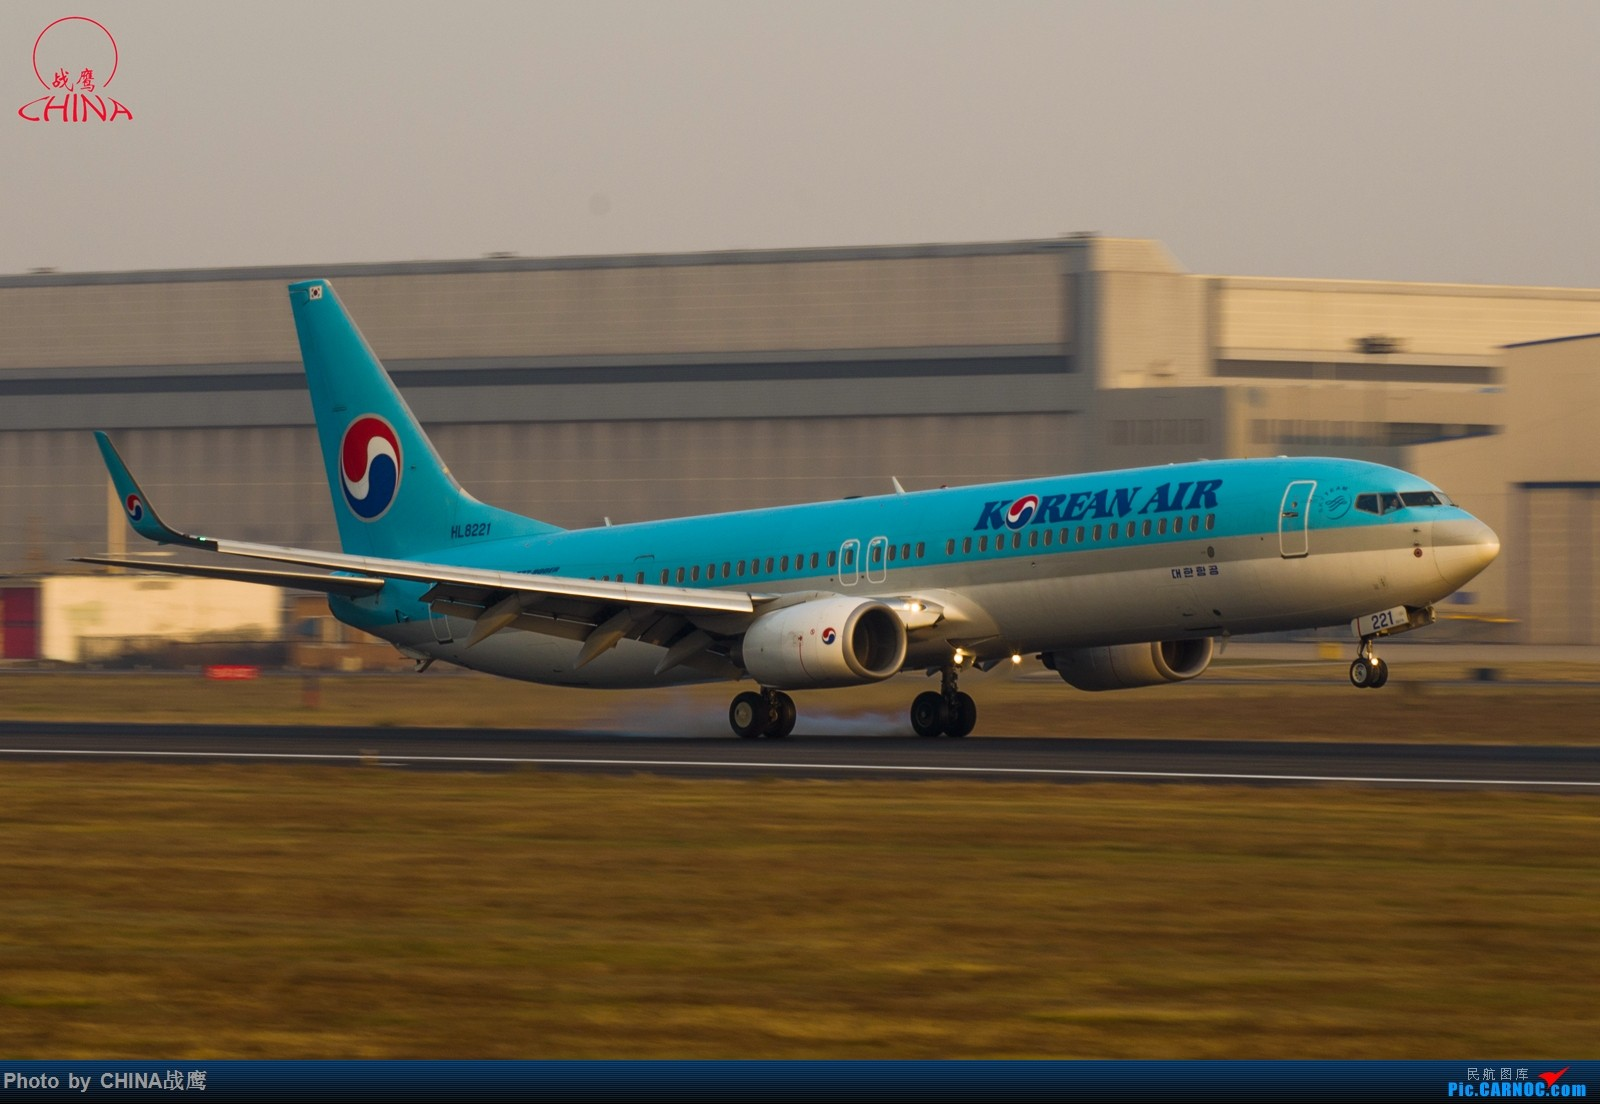 Re:[原创]【SHE】第三季度桃仙拍飞机集锦 BOEING 737-900ER HL-8221 中国沈阳桃仙国际机场